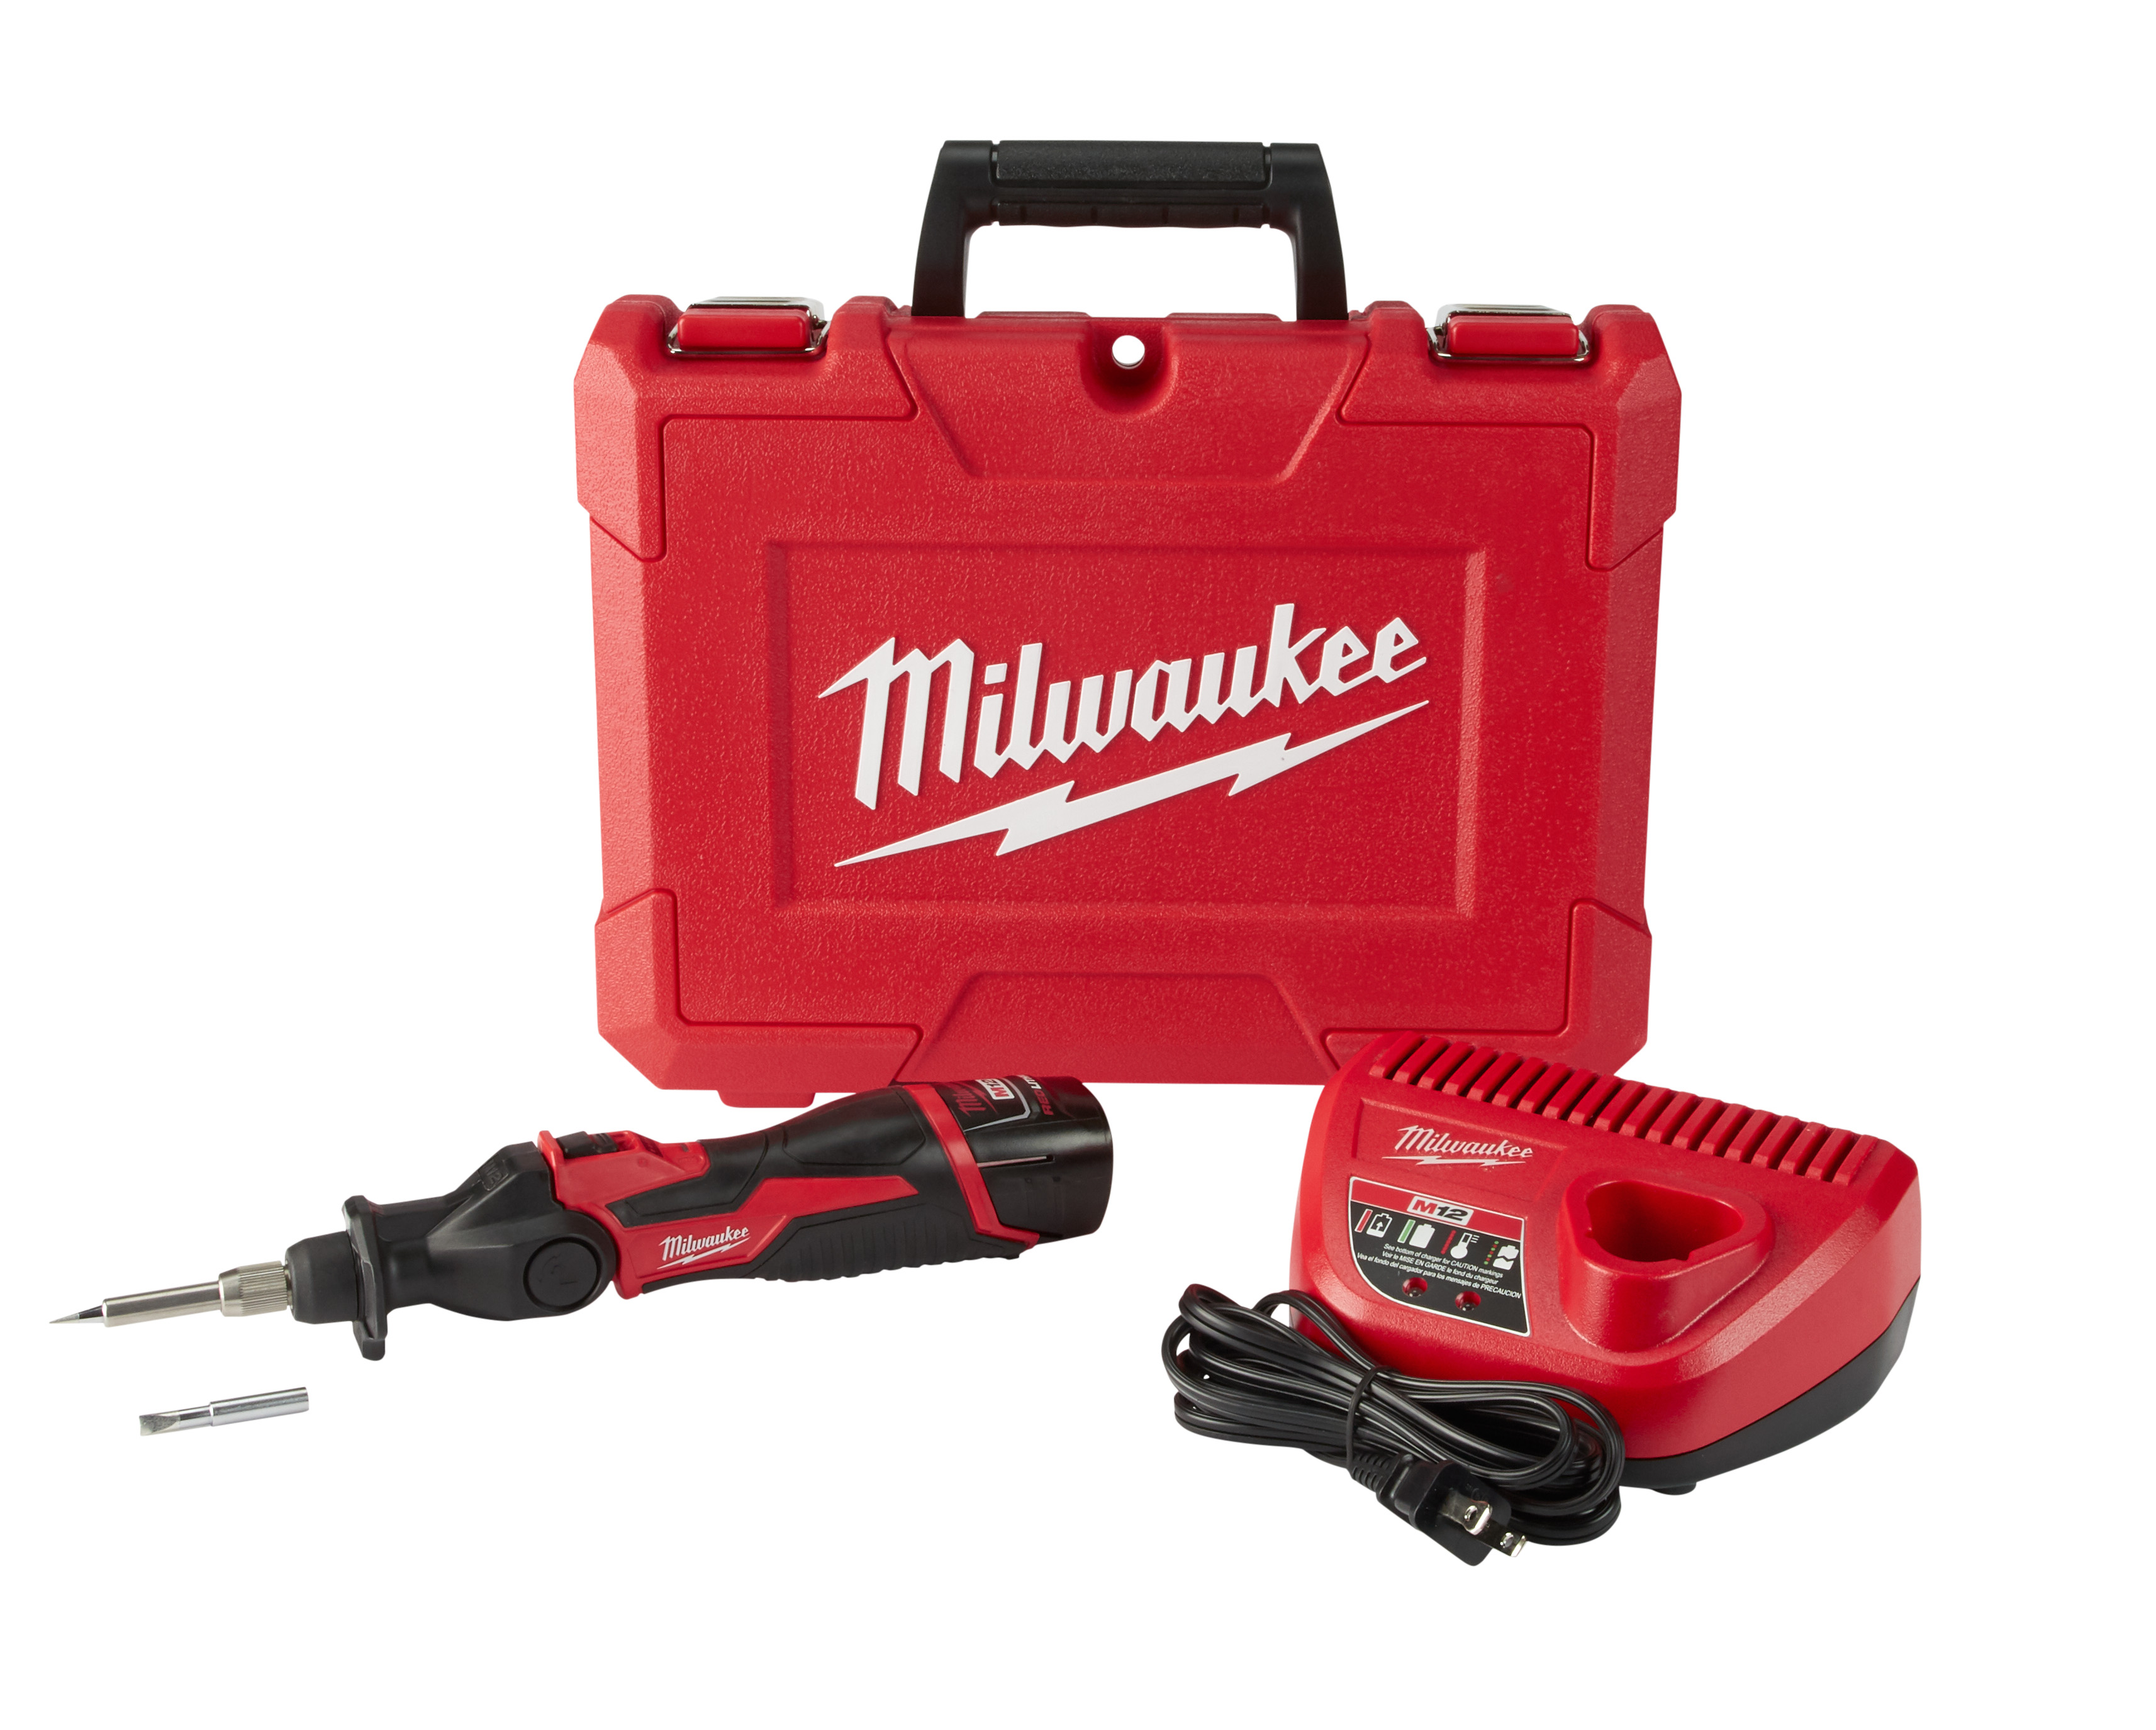 Milwaukee® M12™ 2488-20 Cordless Soldering Iron, 12 VDC, 90 W, 0.02 in Dia Tip, 10-3/4 in L Cord, Pistol Grip Handle